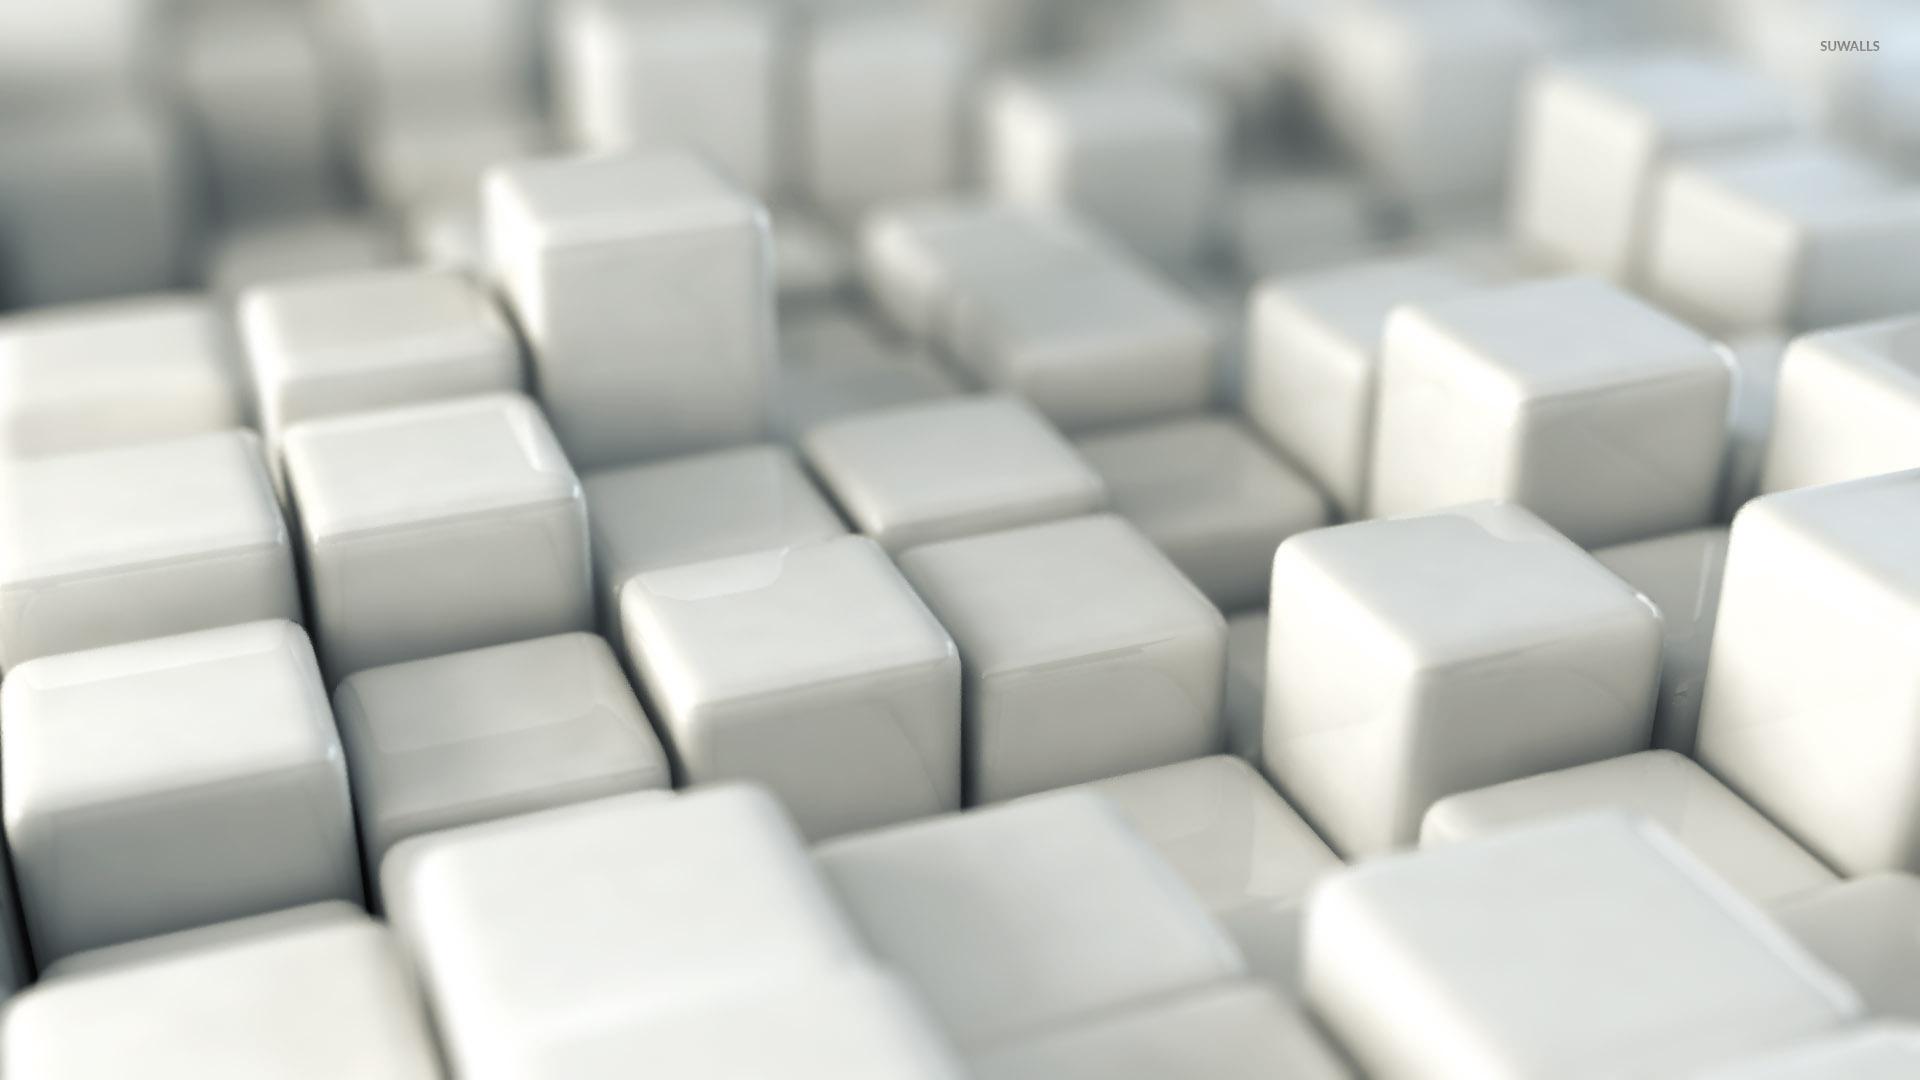 Shiny White Cubes Wallpaper 1920x1080 Jpg